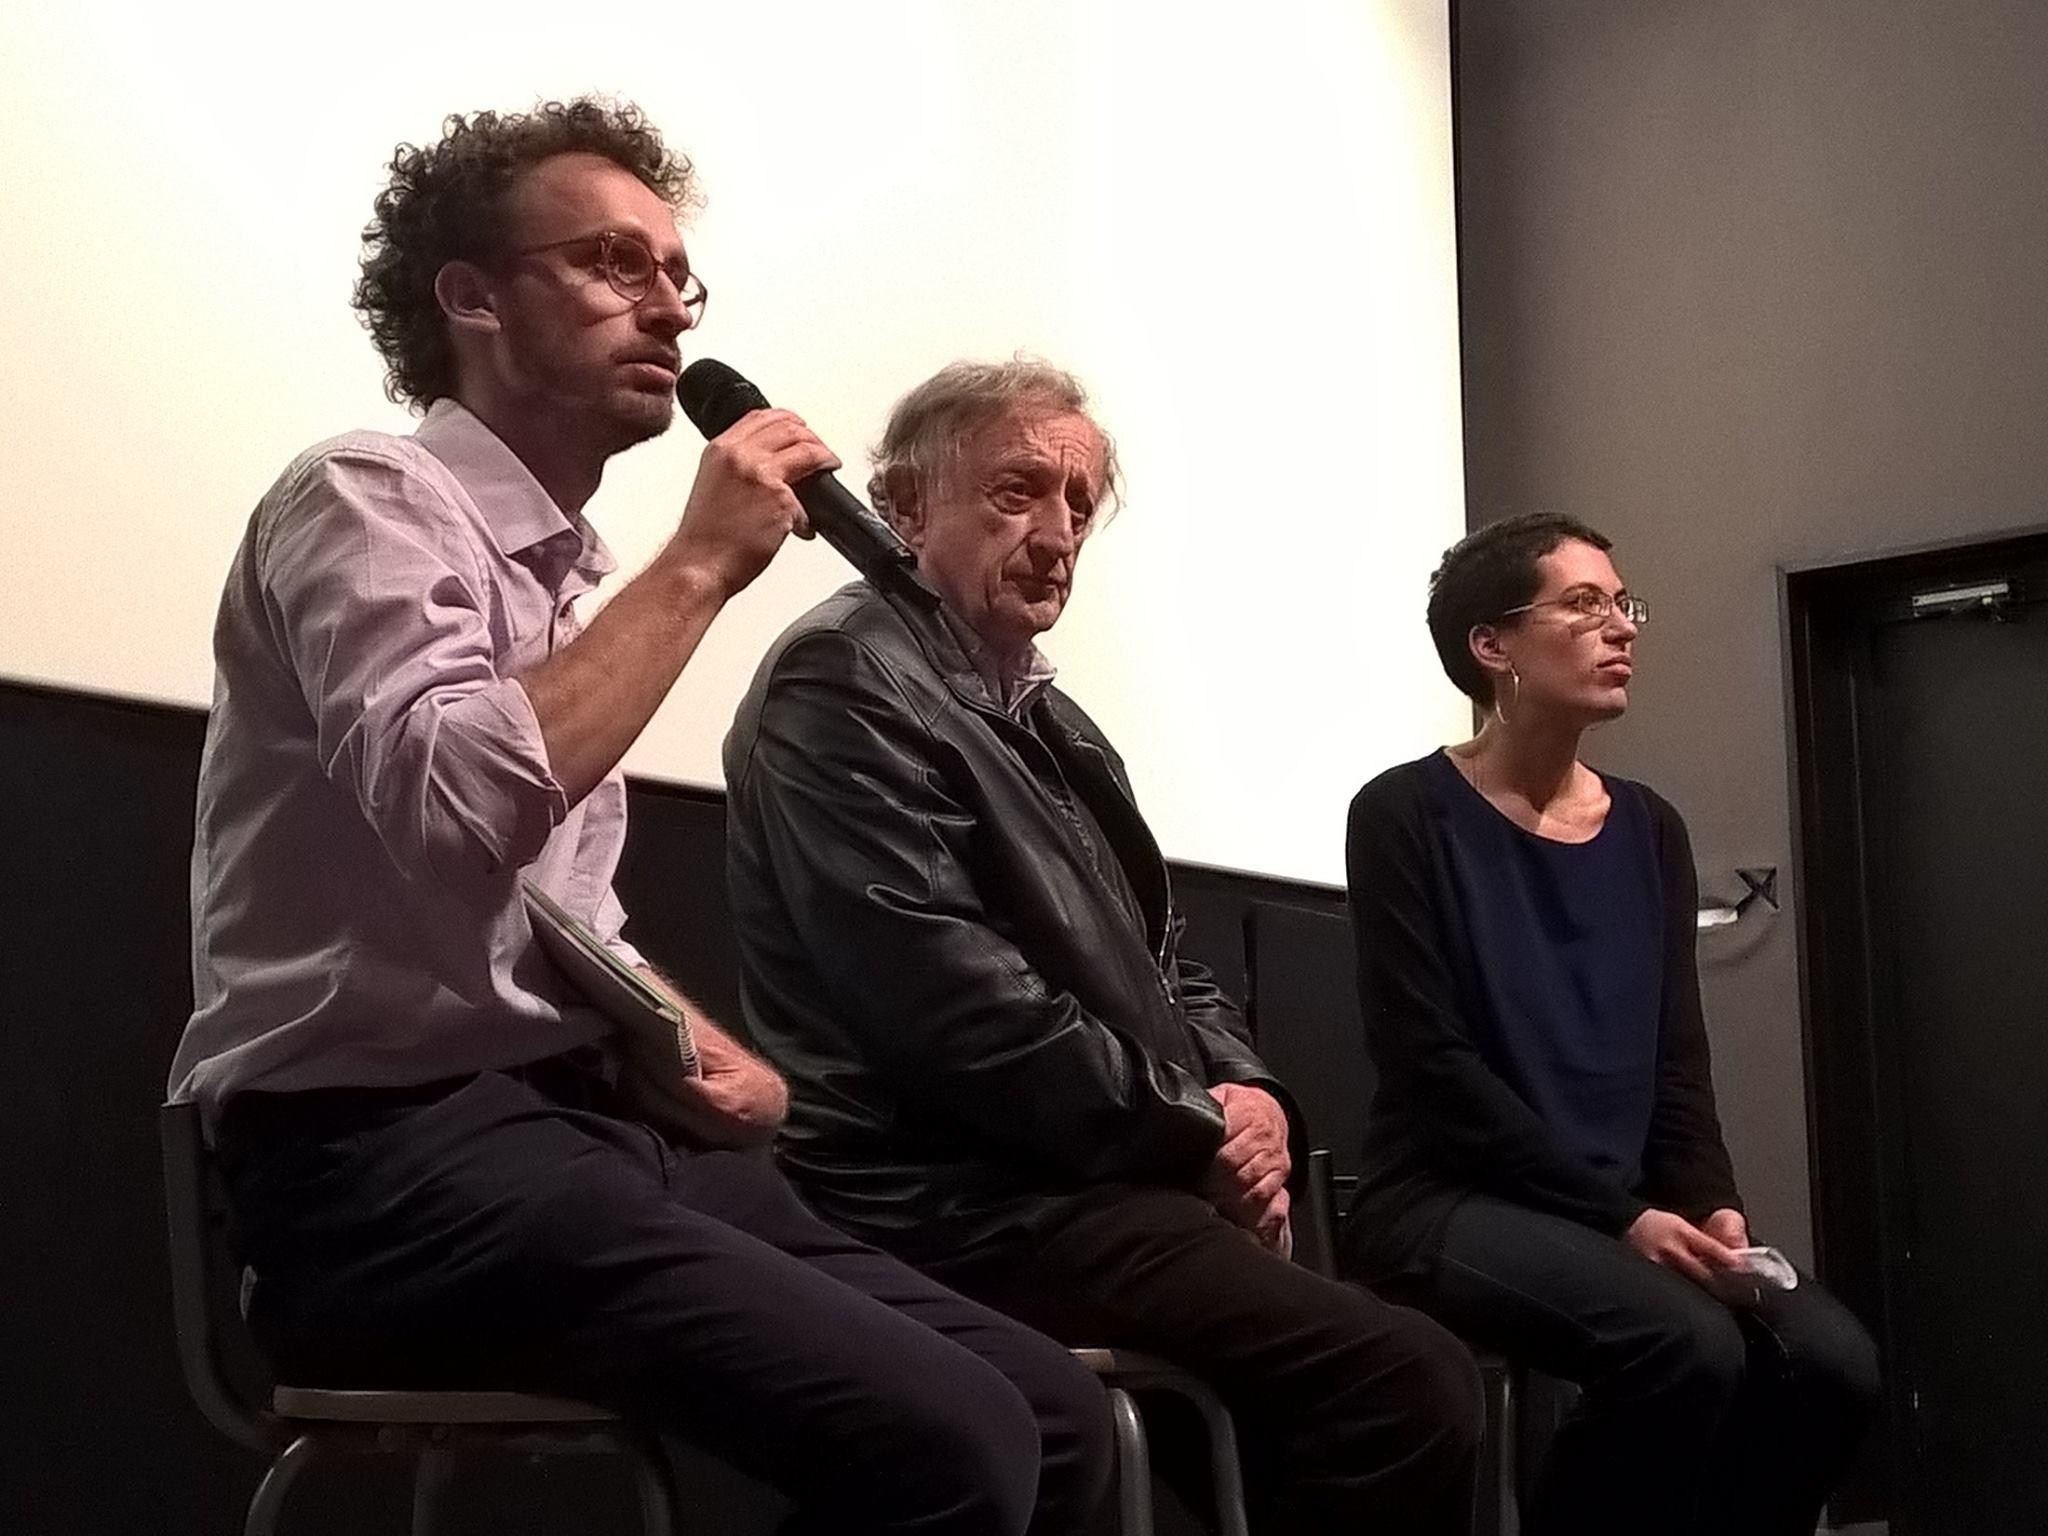 Andrea Paracchini (Journaliste à Altermondes), Bernard Ravenel (historien) et Mathilde Girardot (Catitas) - © FIFDH Paris